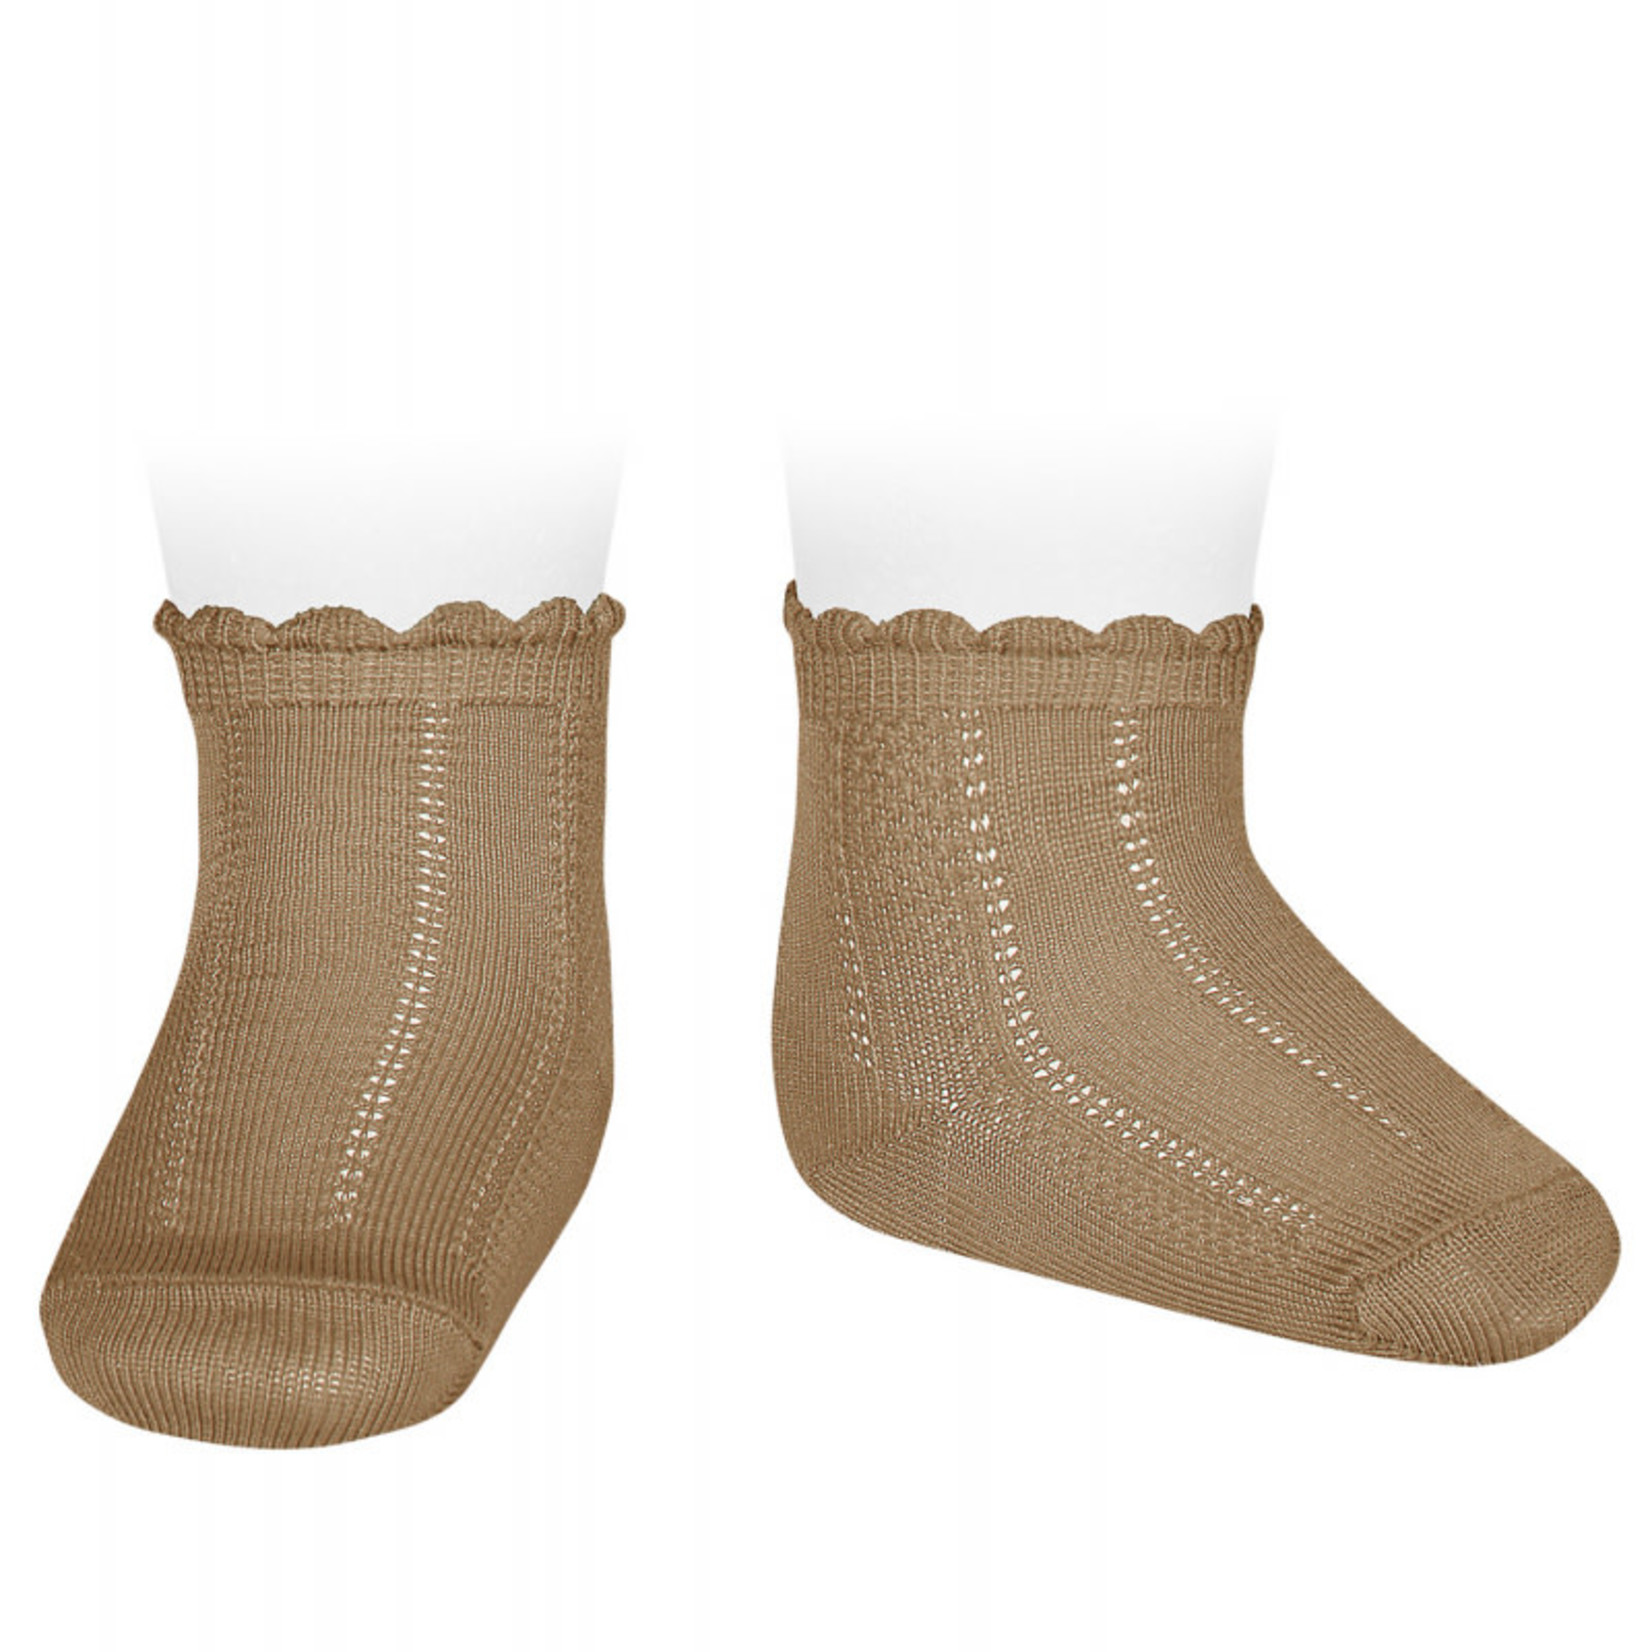 Newborn  Socks - Camel